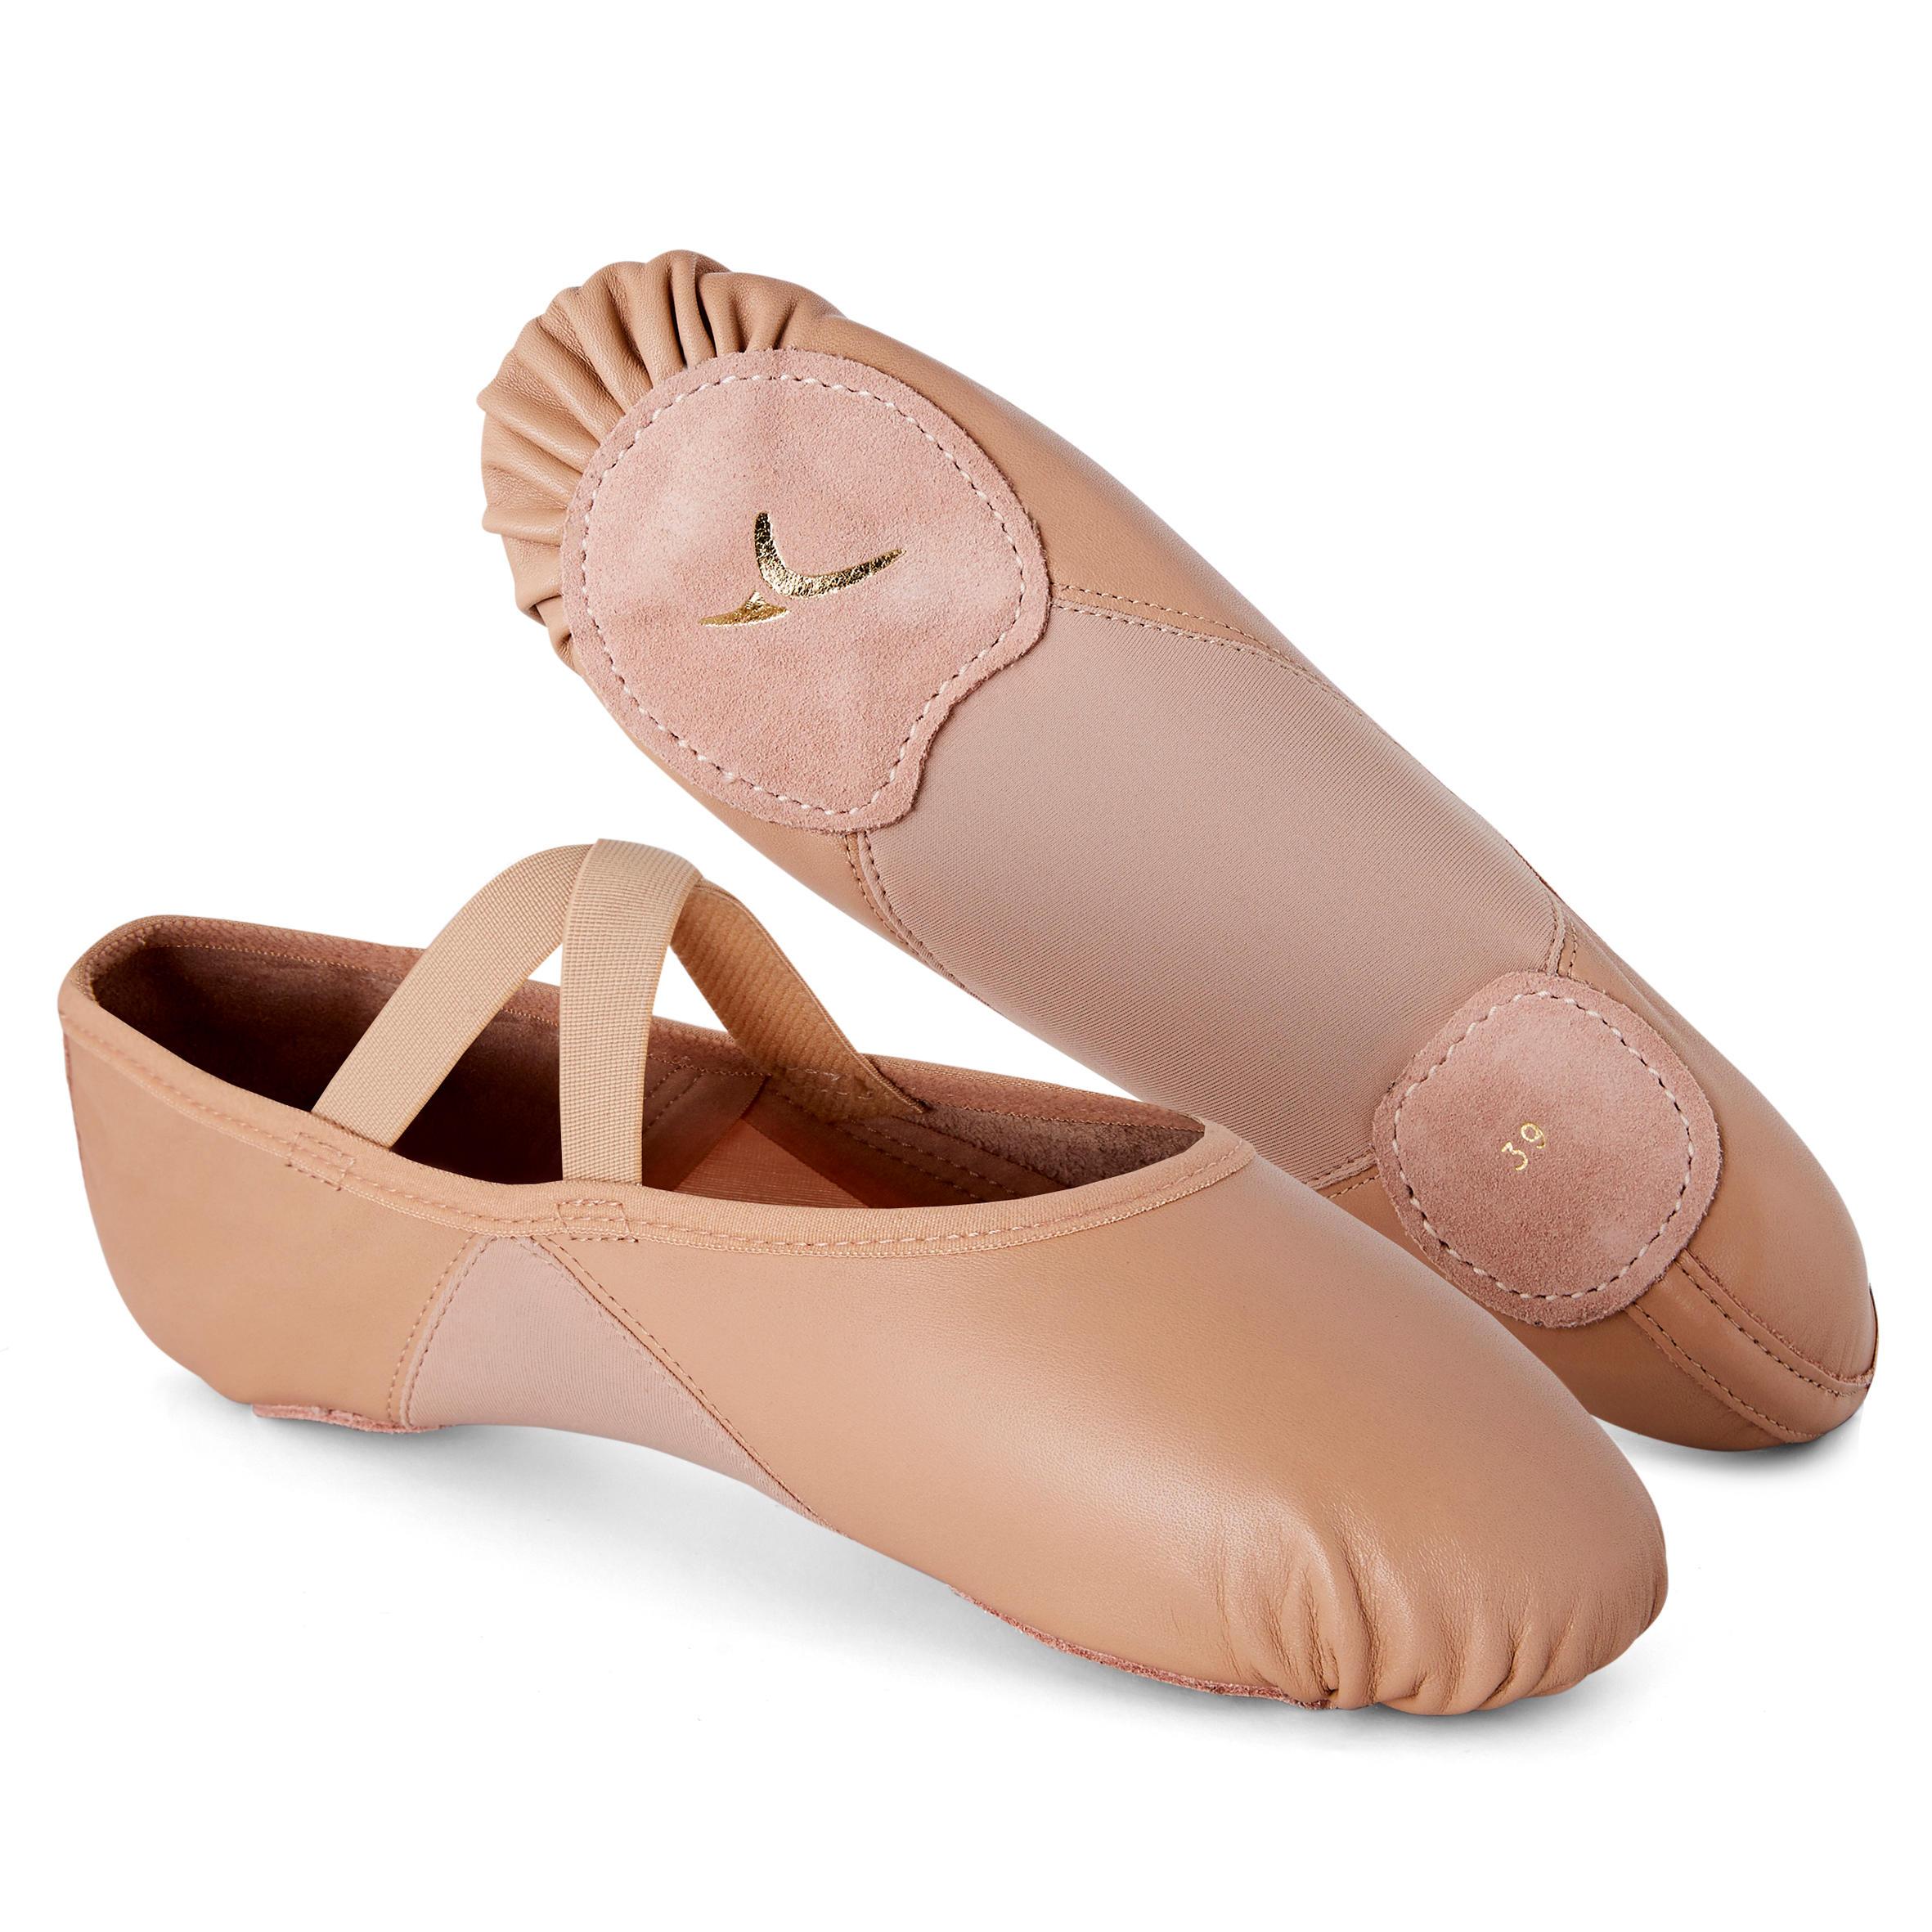 Domyos Demi-pointes danse classique bi-semelles en cuir souple beige tailles 28-40 - Domyos